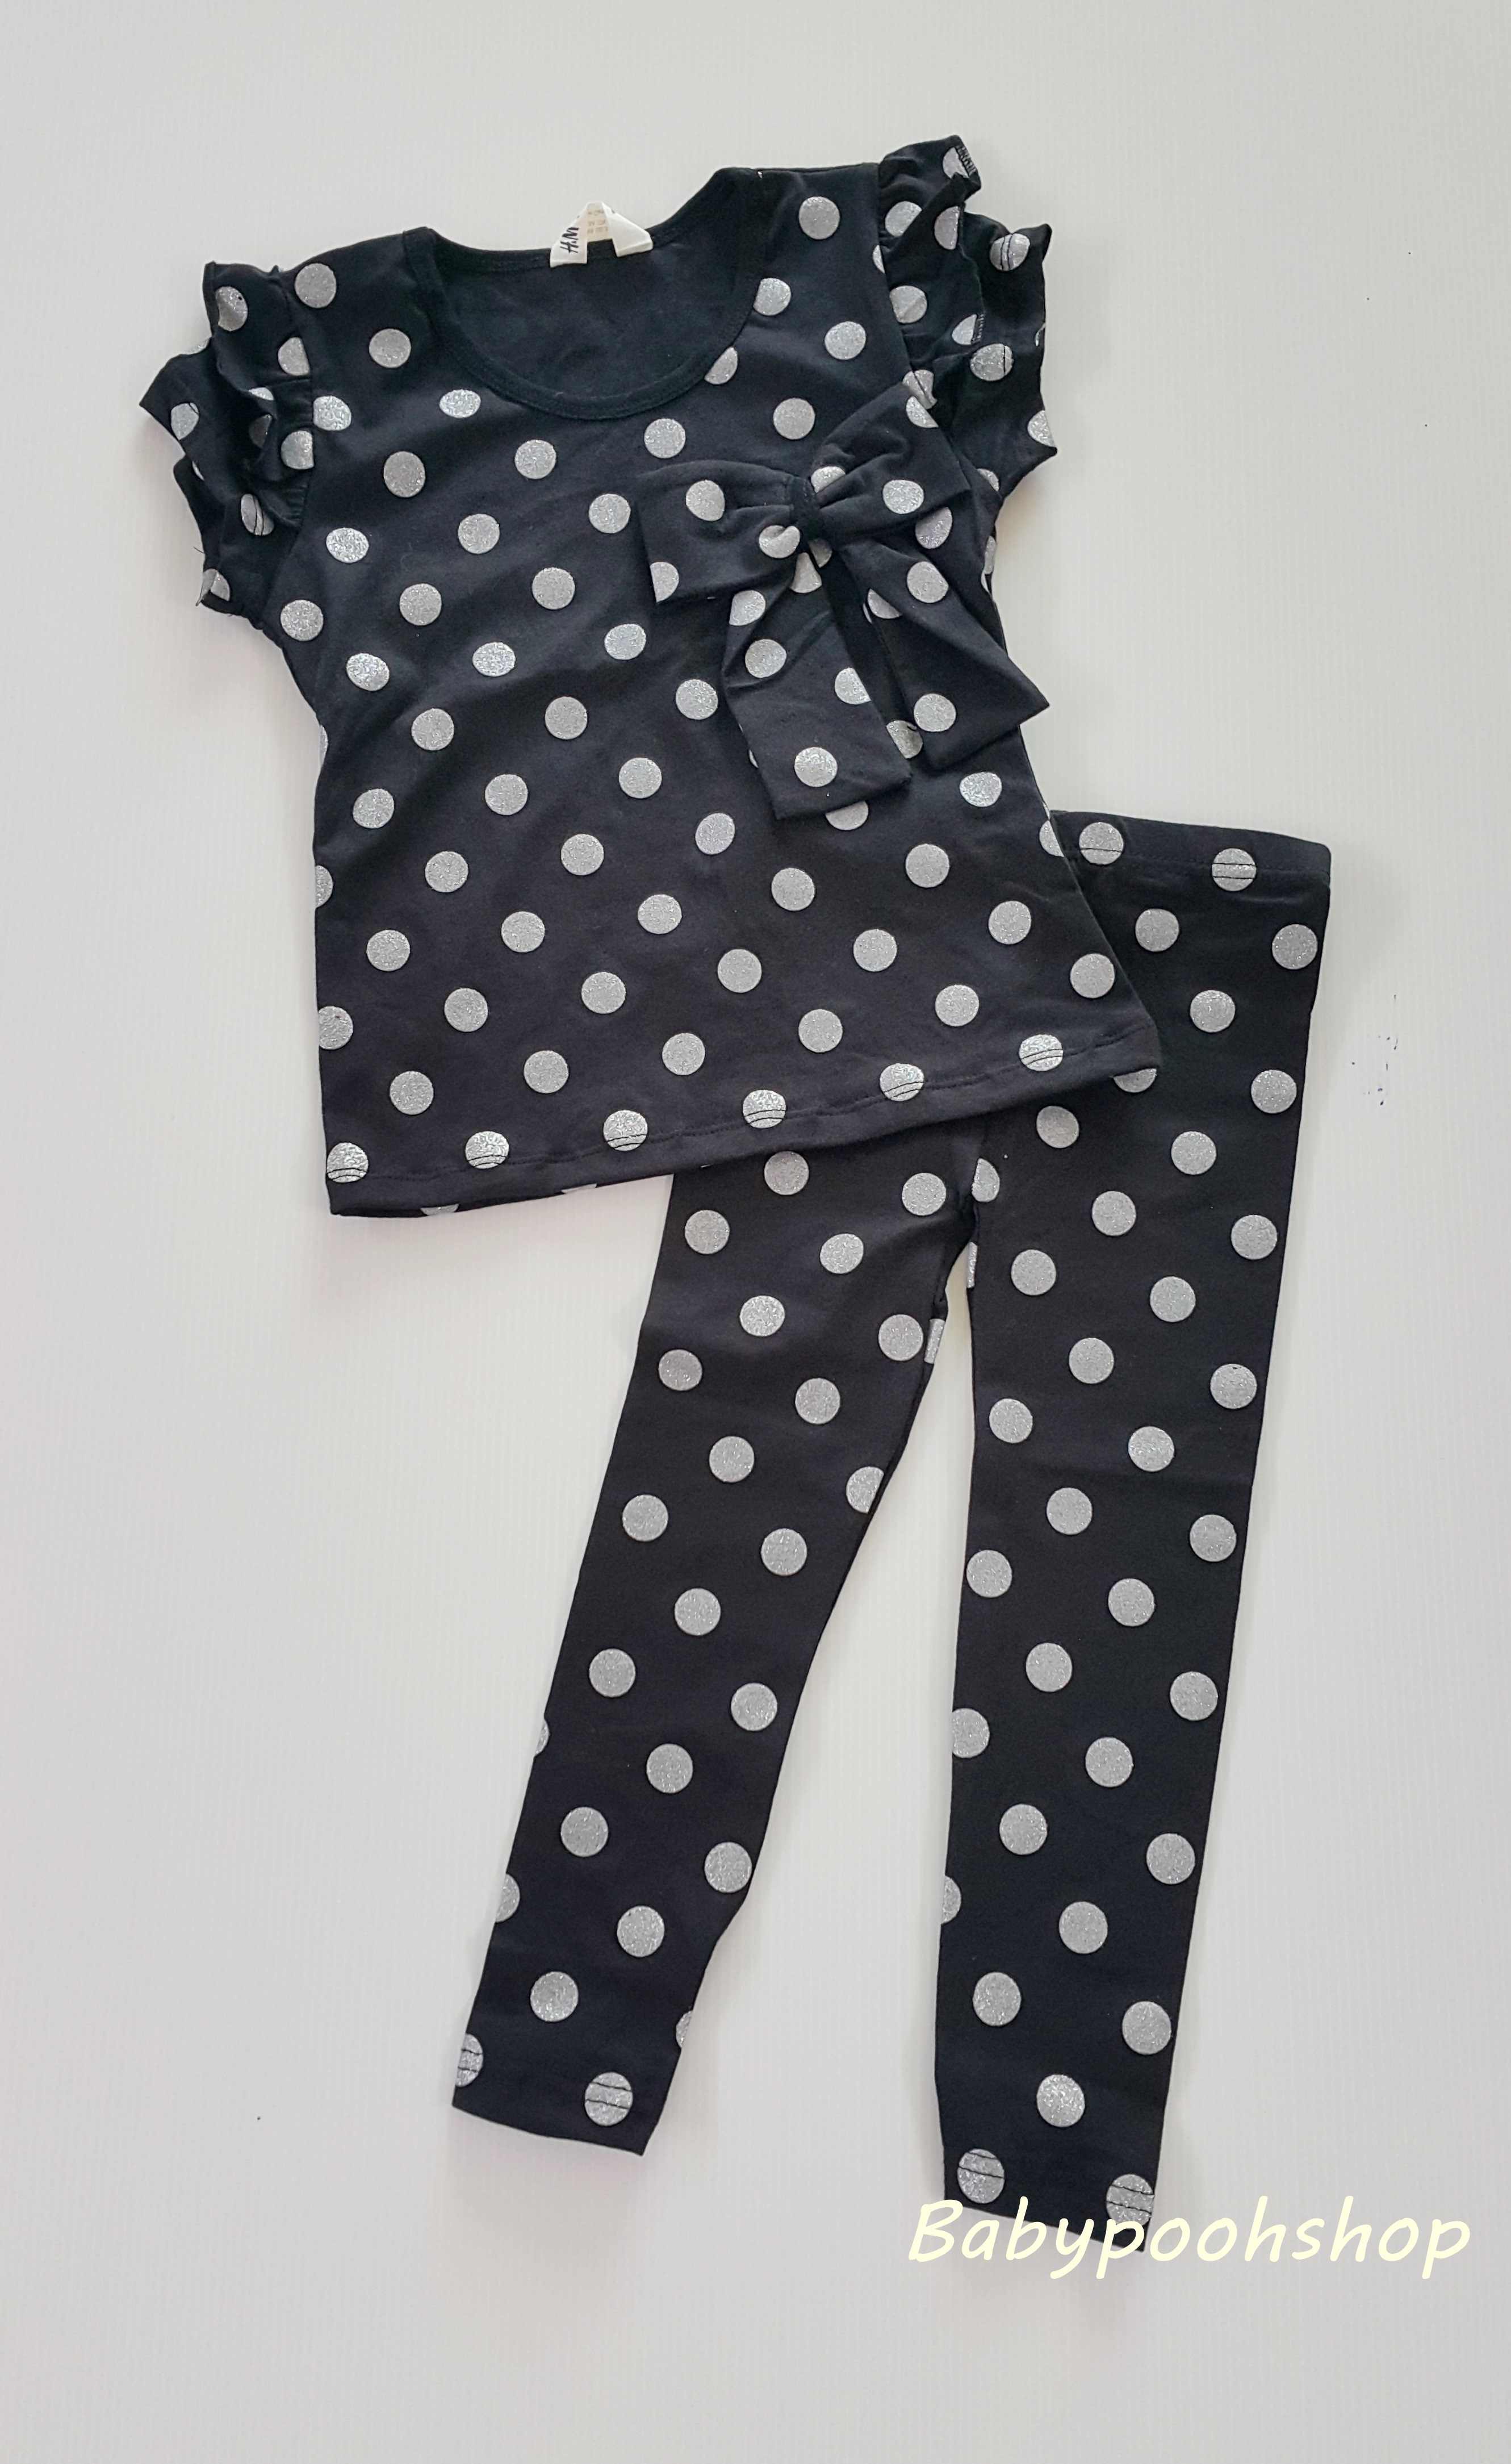 H&M : set เสื้อ+เลกกิ้ง สีดำ ลายจุด size : 2-3y